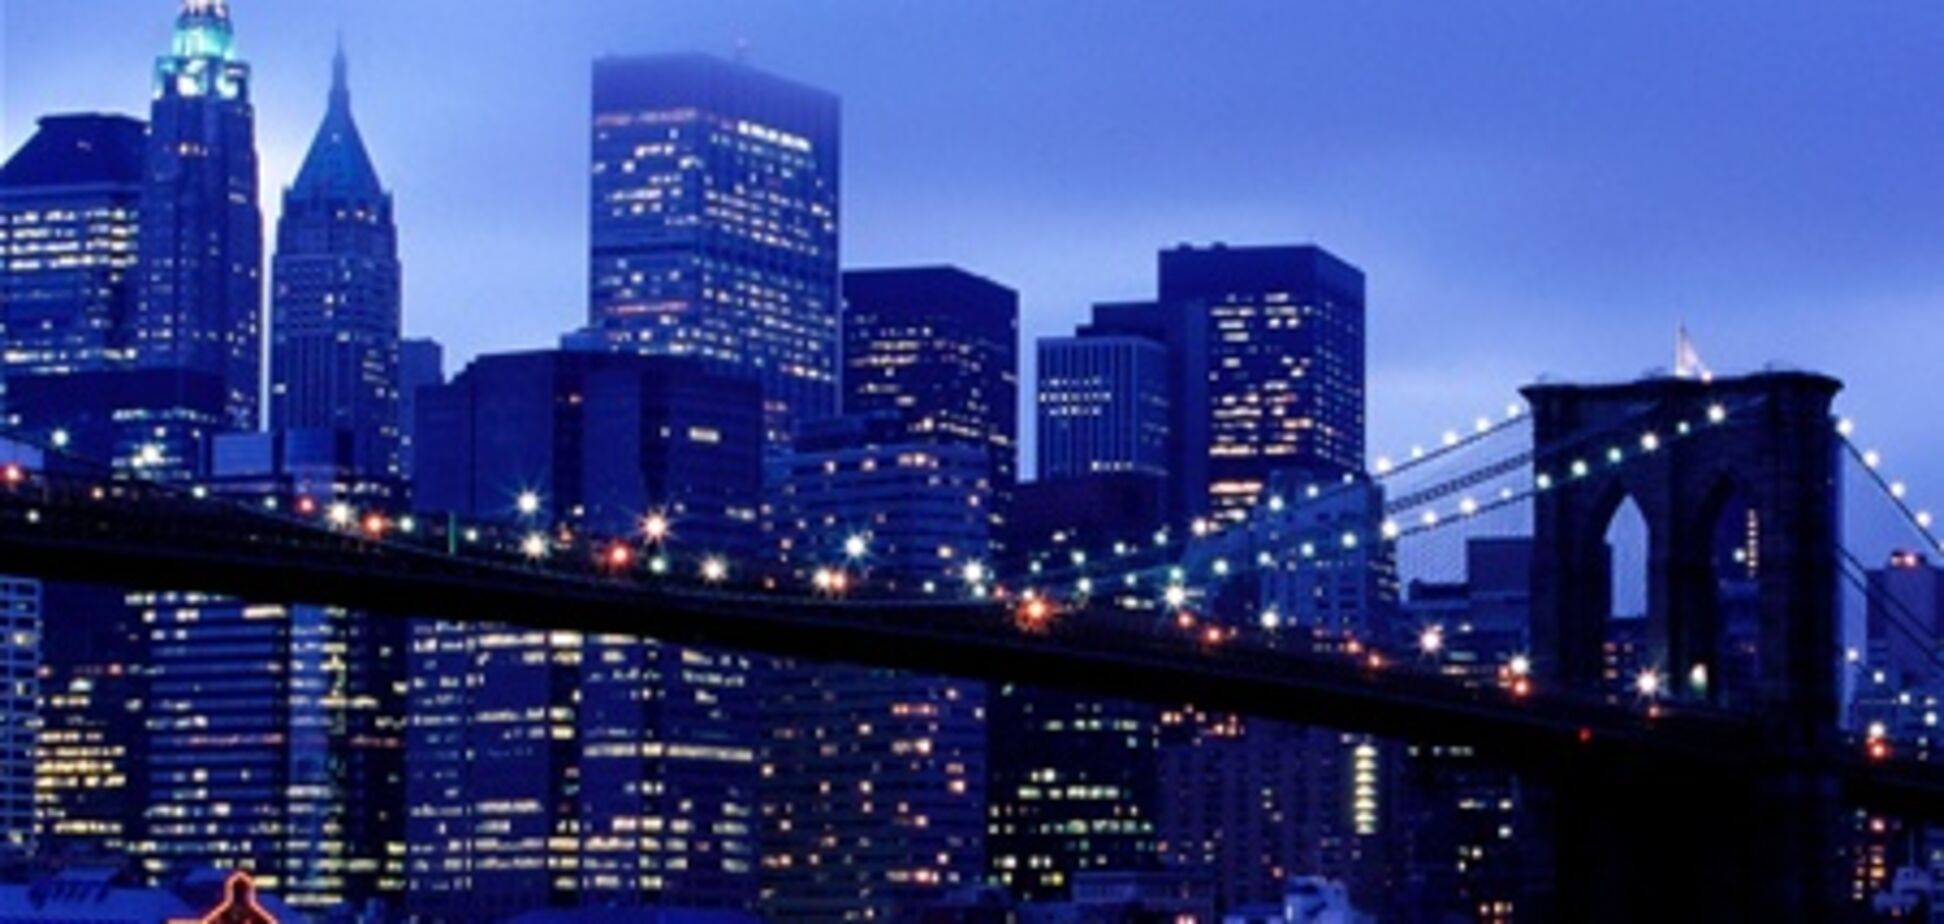 Аренда жилья на Манхеттене подорожала